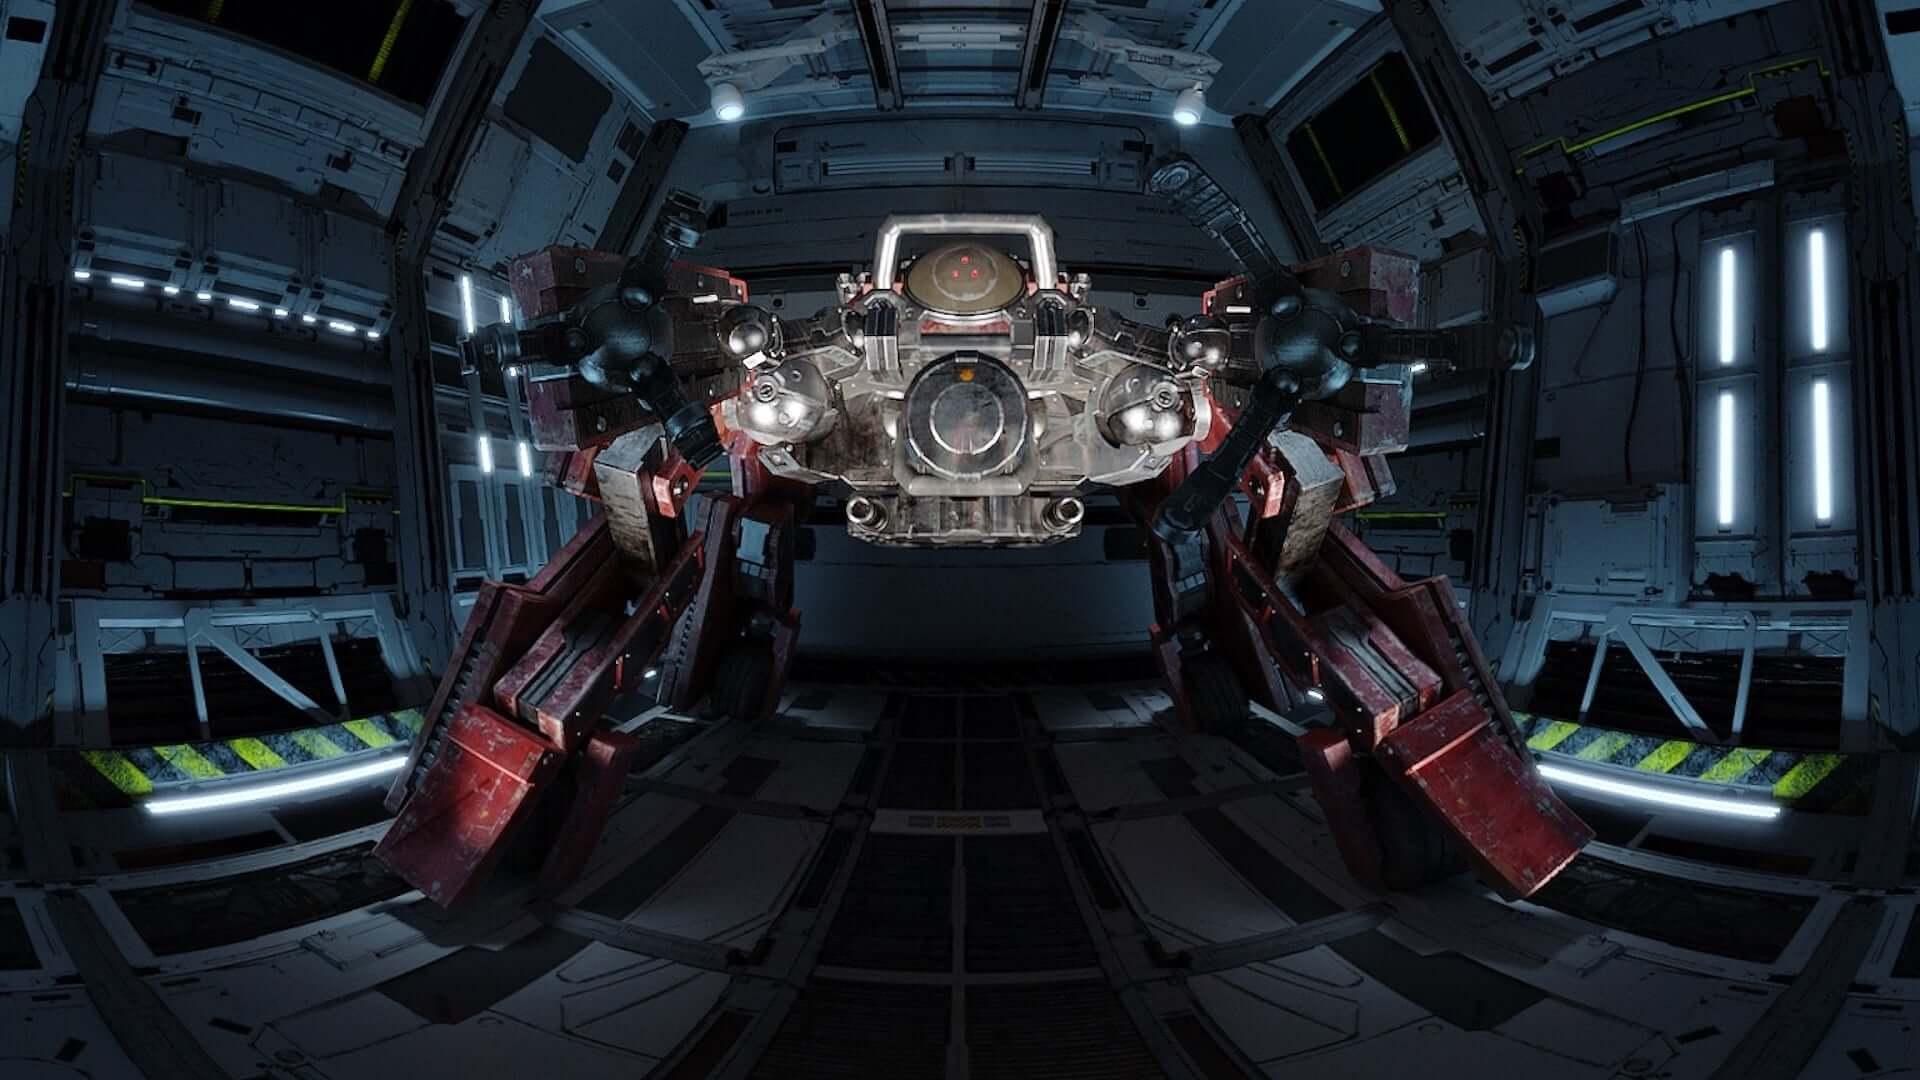 VR作品としては日本初!『攻殻機動隊 GHOST CHASER』が<第76回ベネチア国際映画祭>に正式招待 film190725ghost-chaser_9-1920x1080